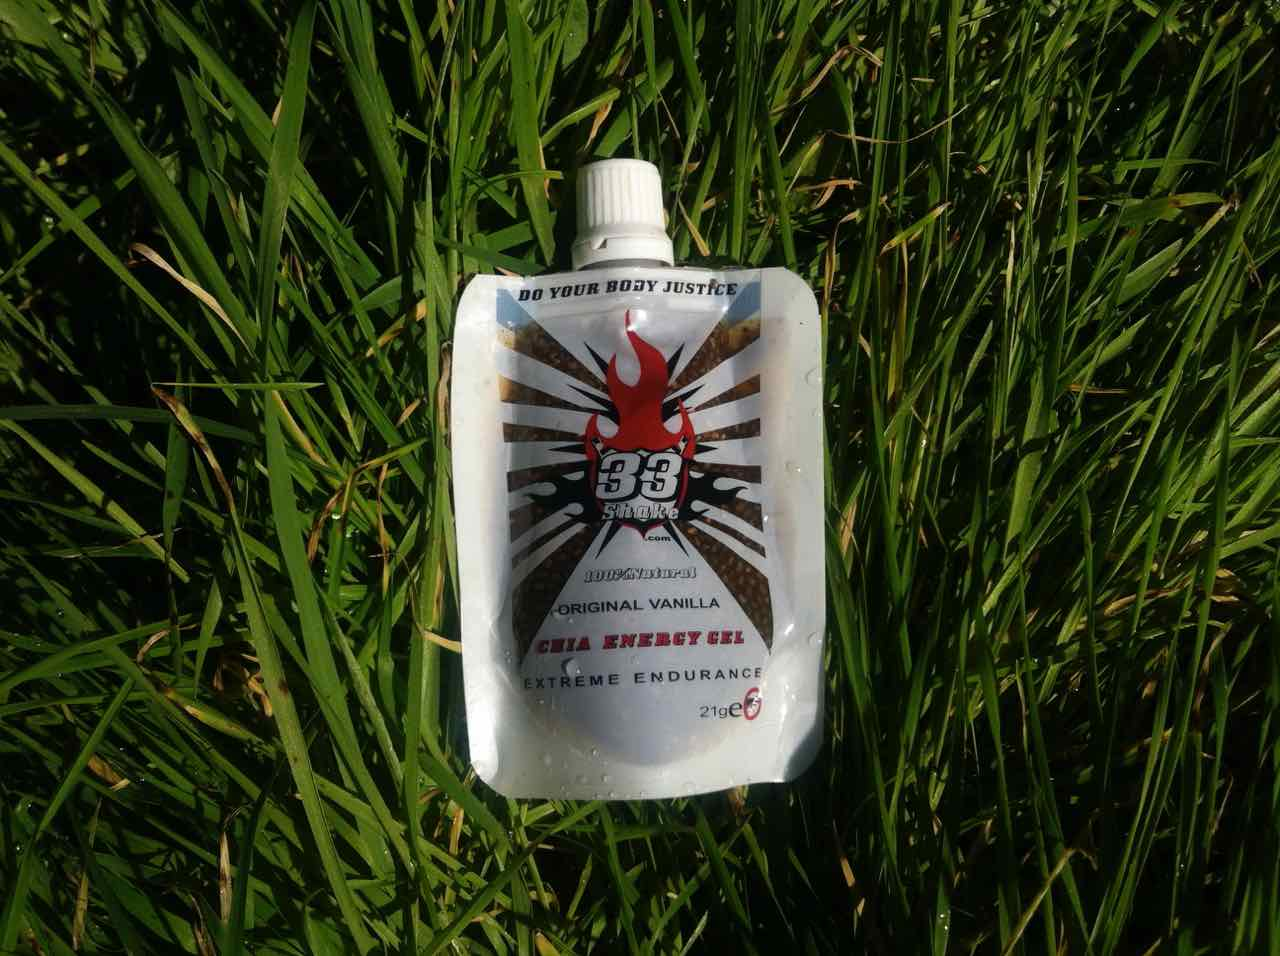 Coffee and athletic performance - 33Shake chia energy gel